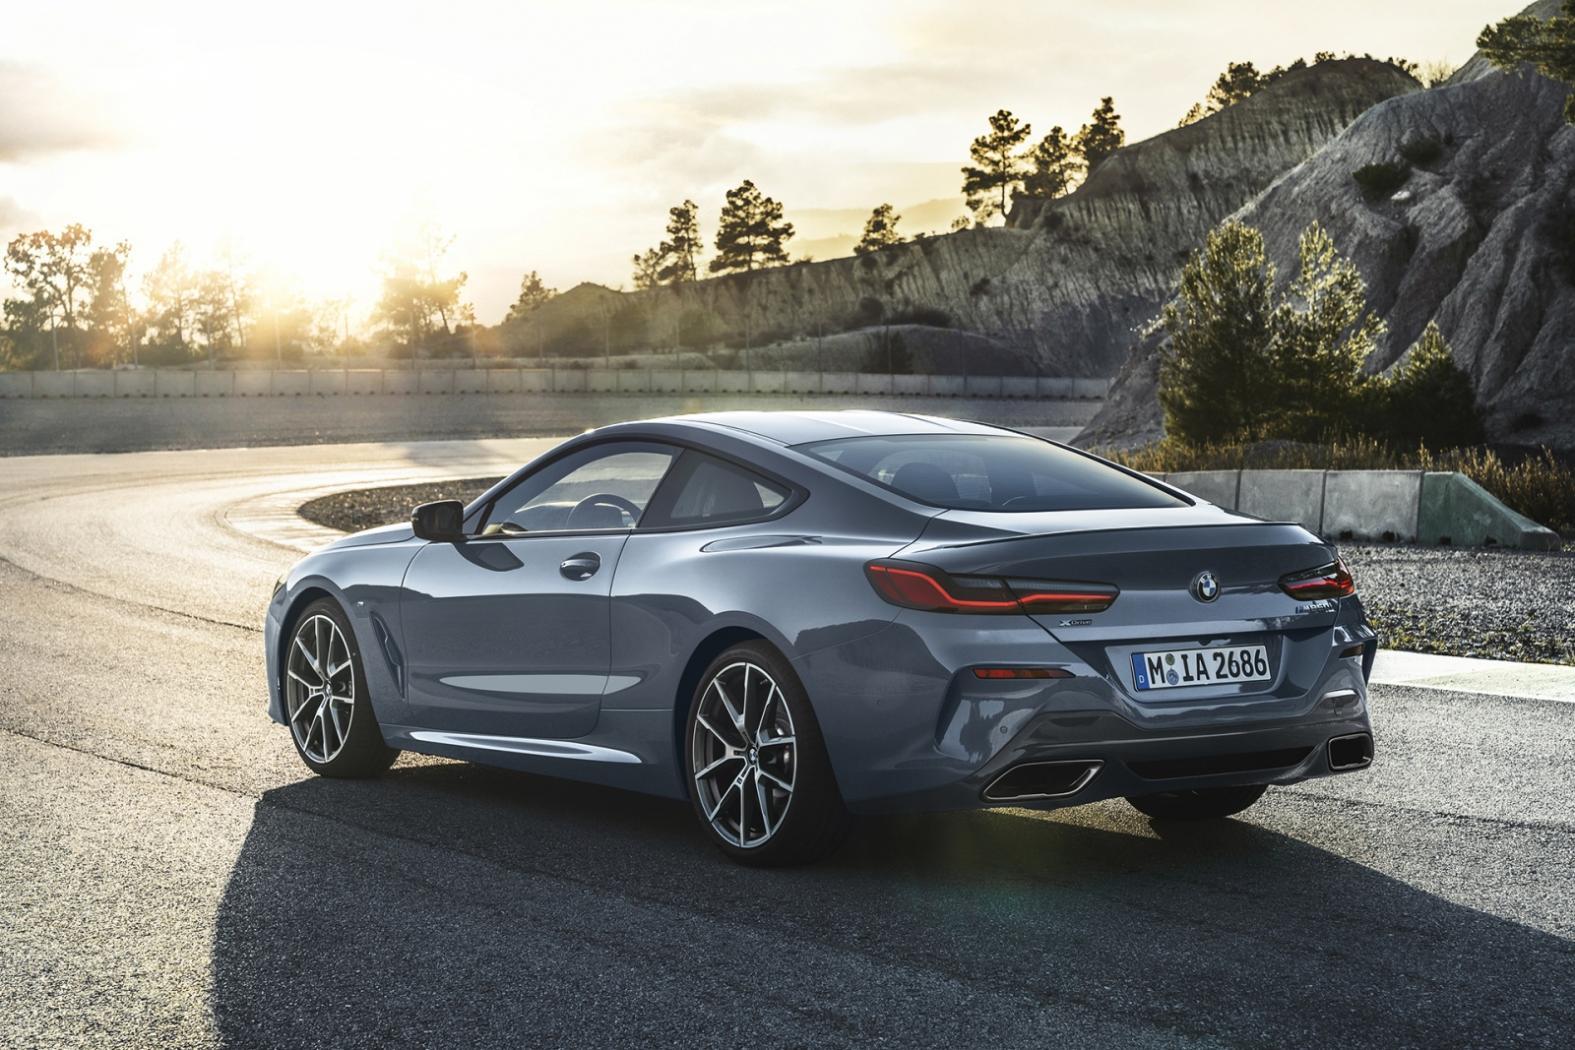 Nouvelle-BMW-Serie-8-G15-7.jpeg